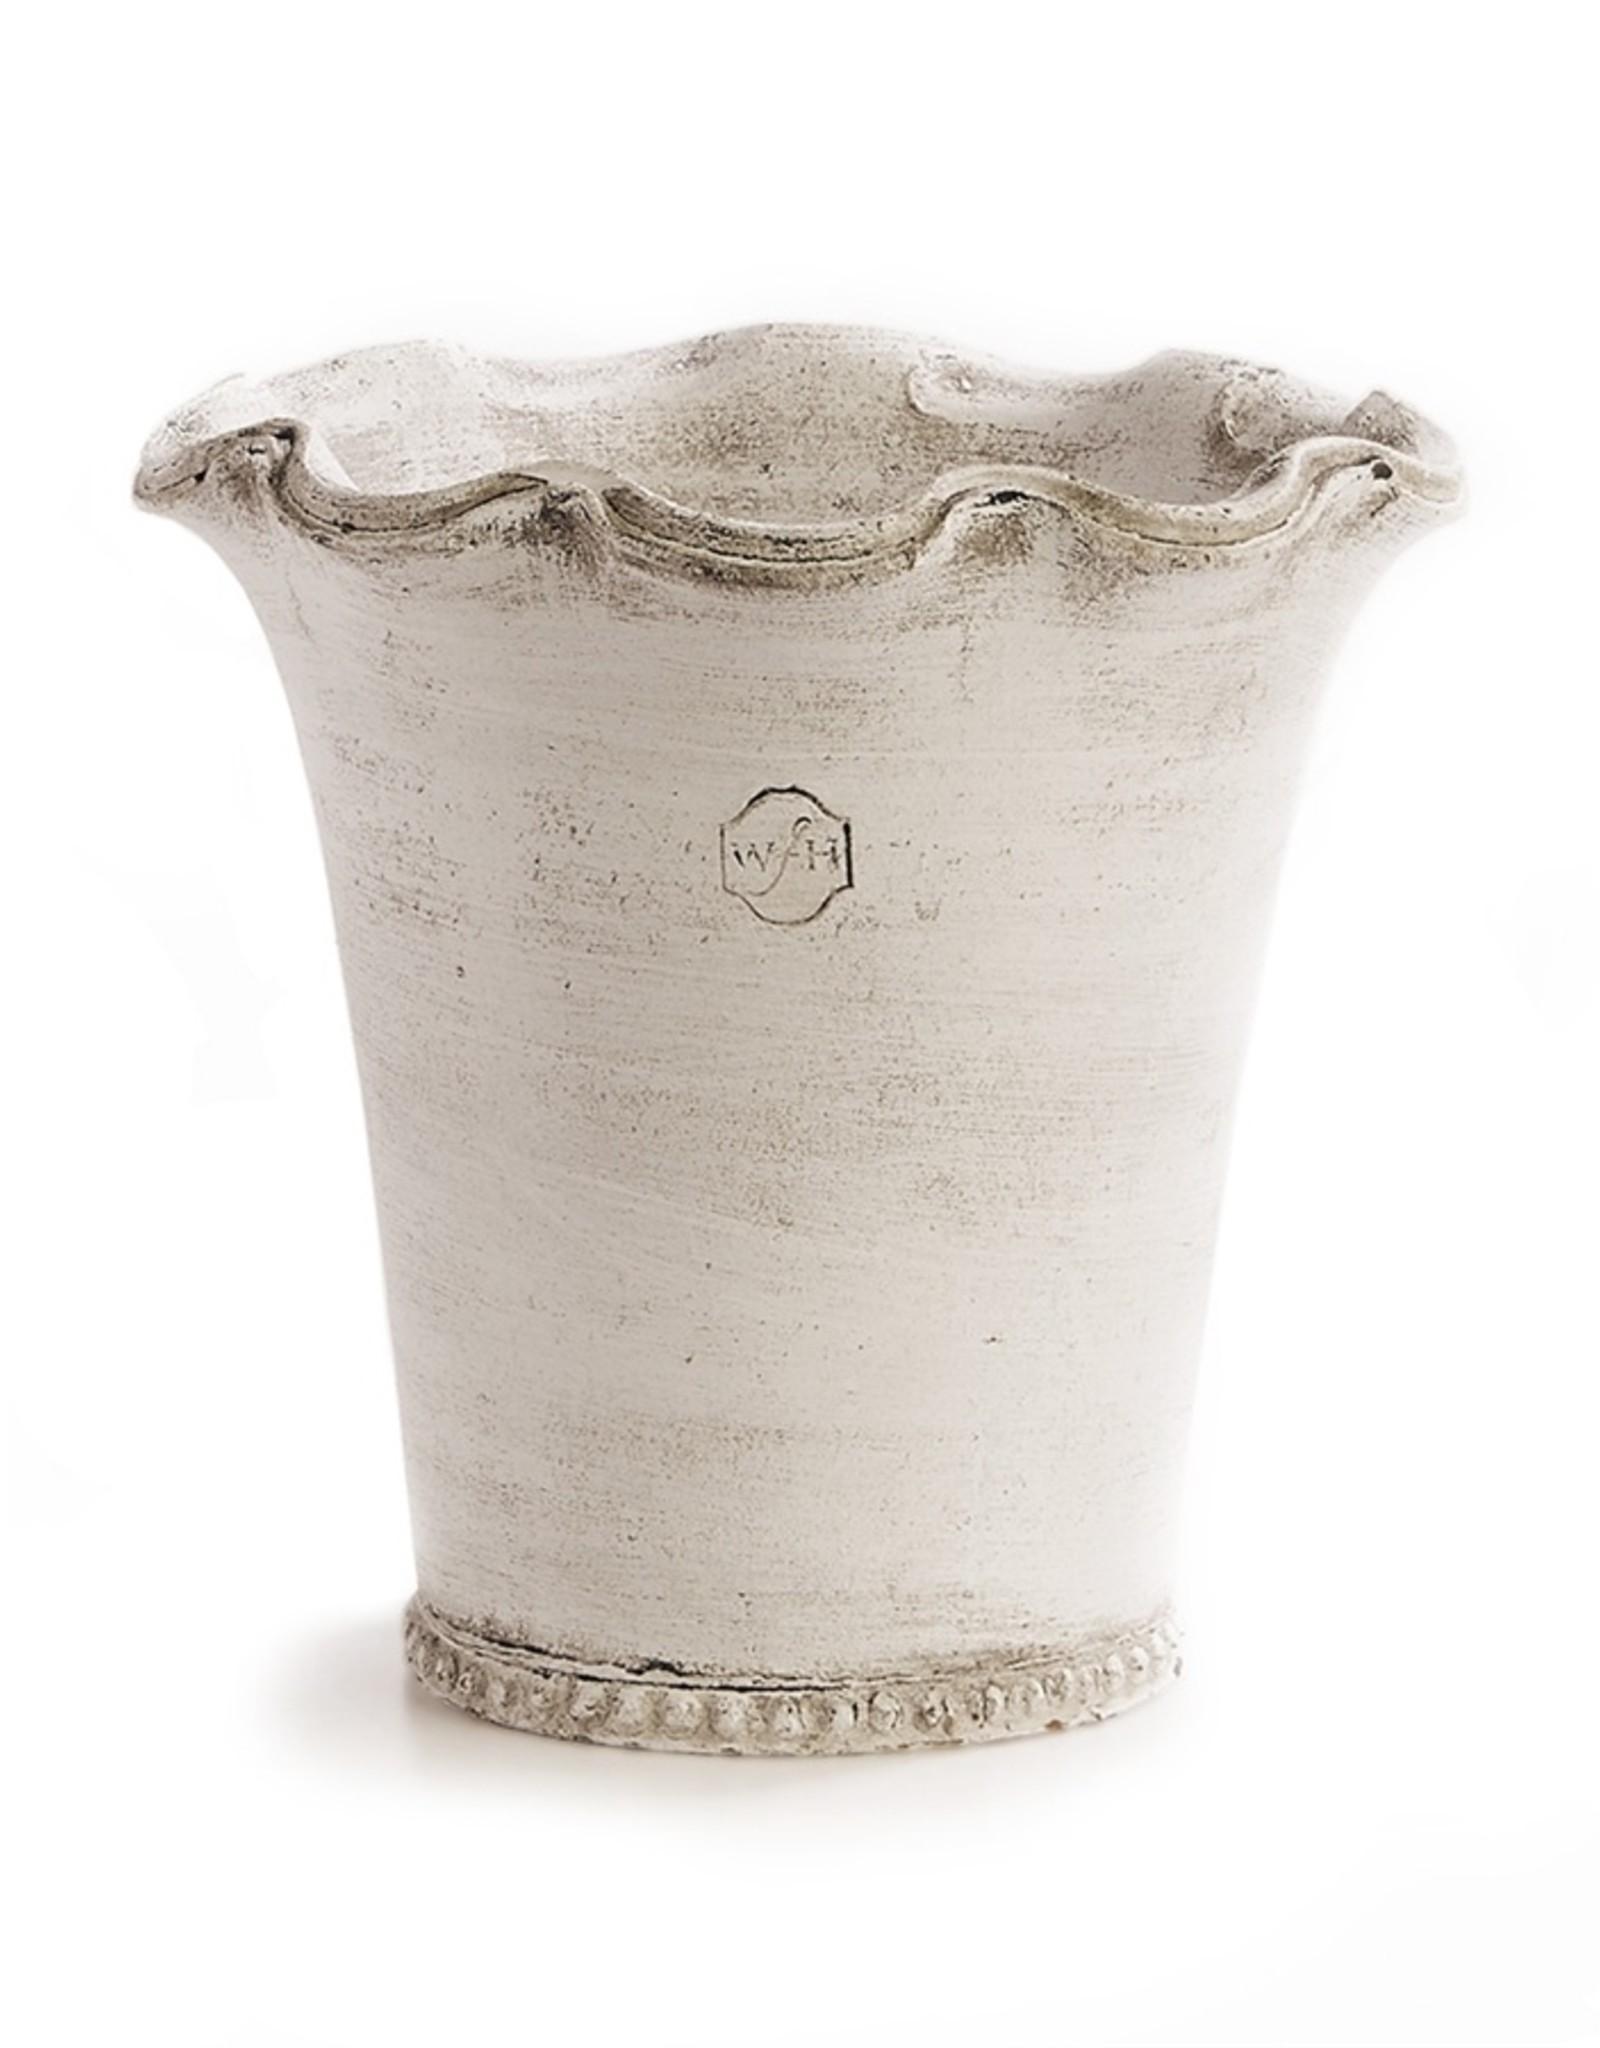 Napa Home and Garden Wakefield Handmade Festonee Vase